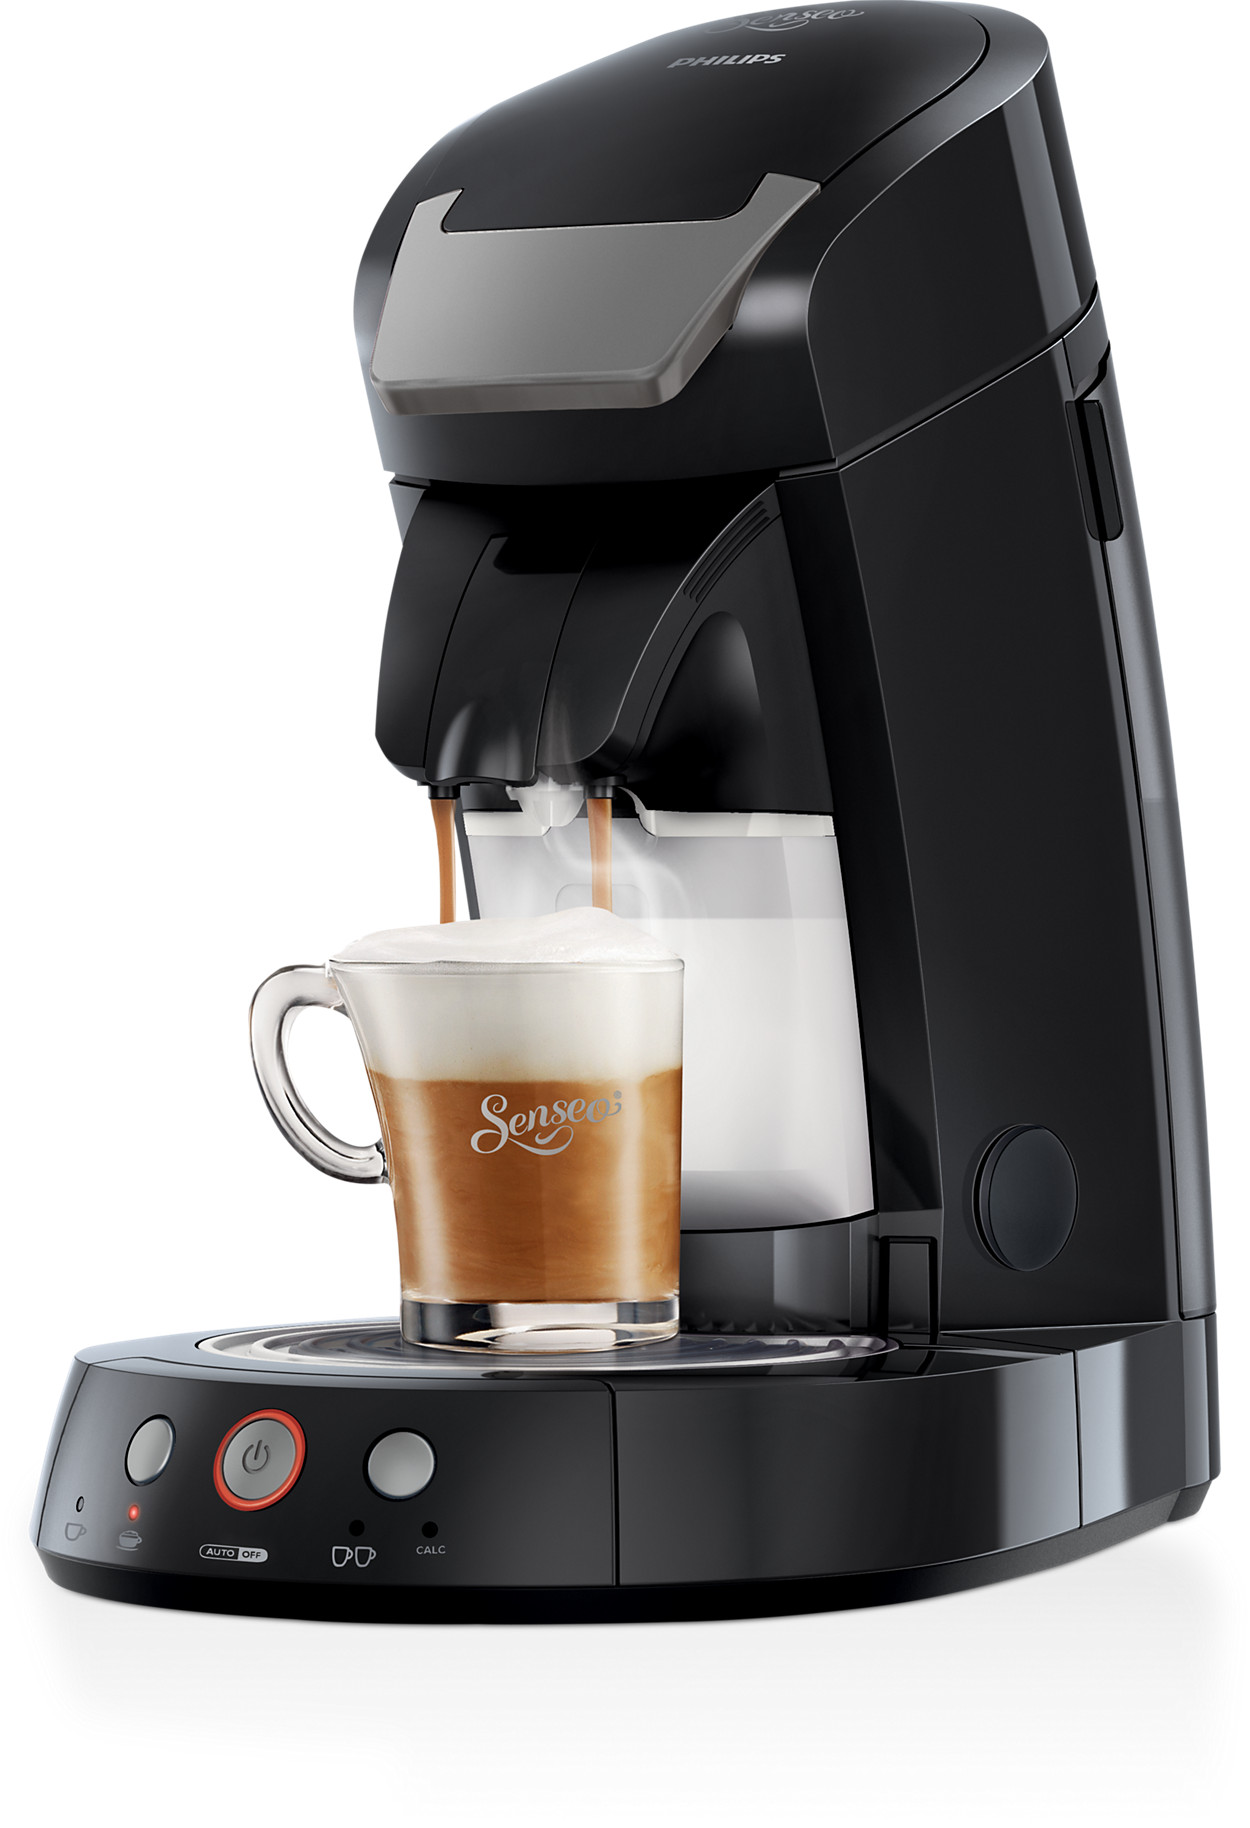 de senseo cappuccino select koffiepadmachine hd7853 60 kopen. Black Bedroom Furniture Sets. Home Design Ideas